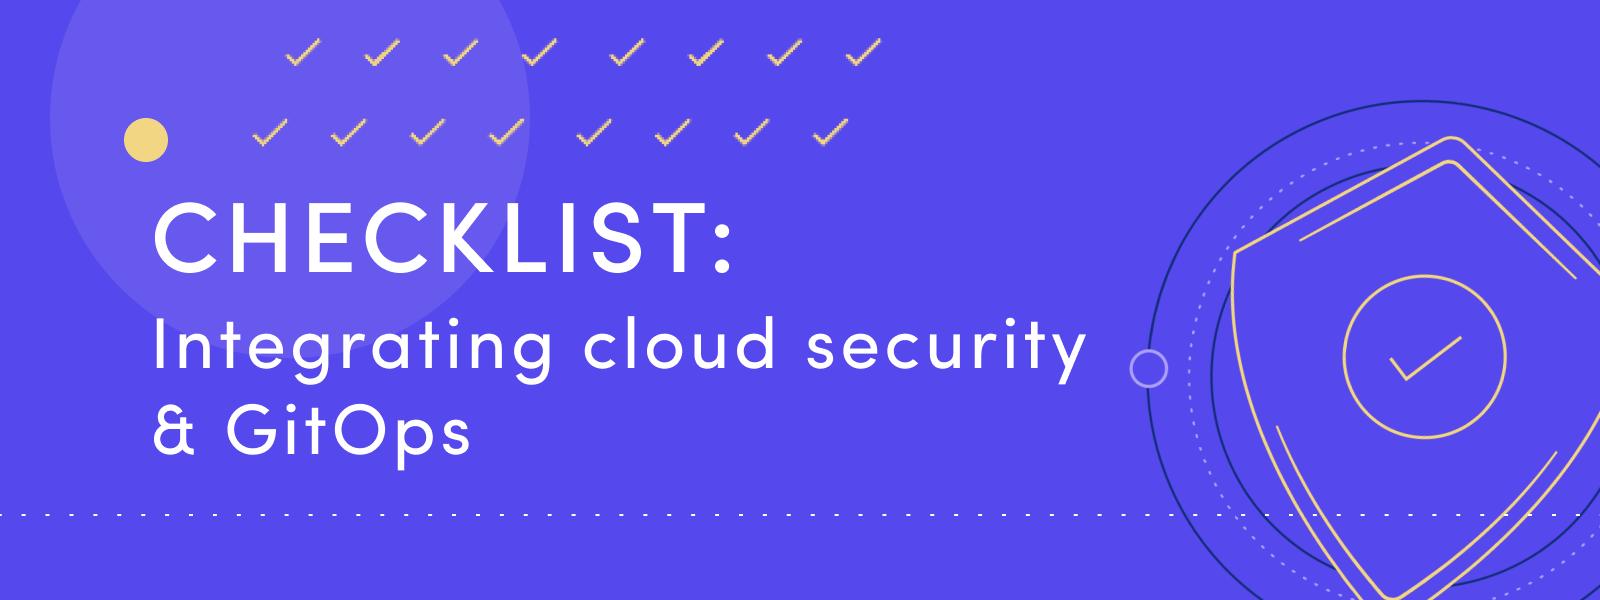 GitOps checklist form image shortened